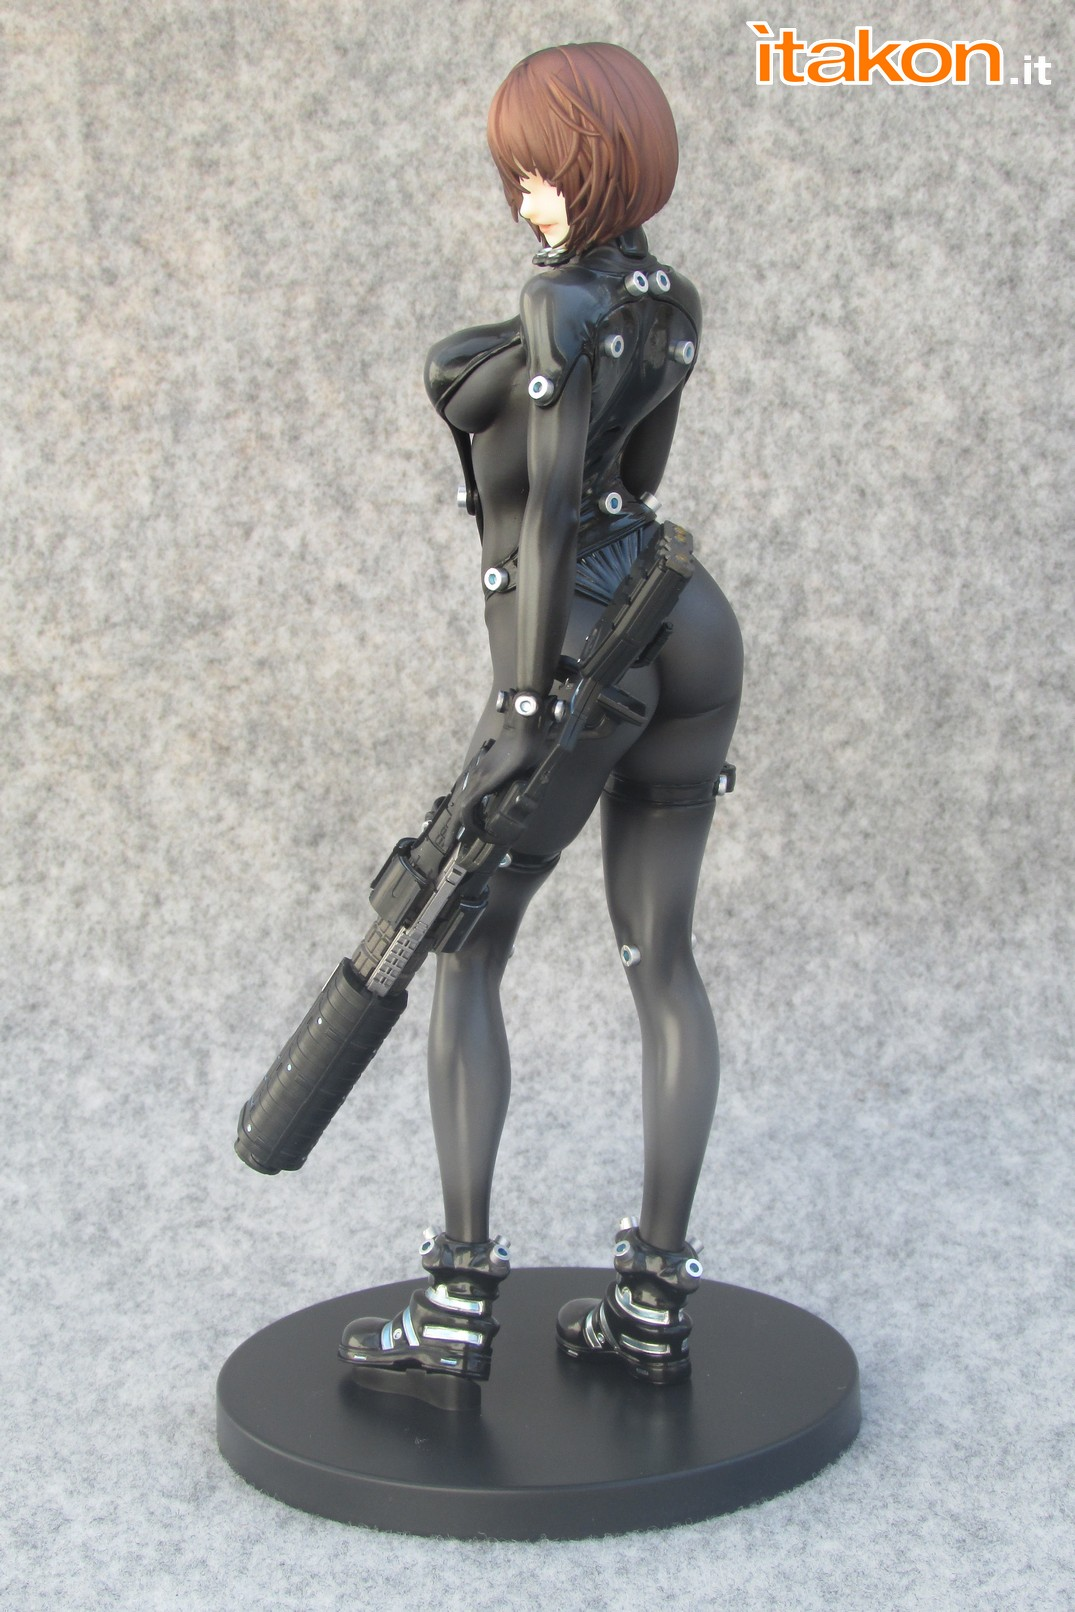 Link a Recensione review Yamasaki Anzu X Shotgun ver. da Gantz 0 di Union Creative International Ltd Itakon.it 18